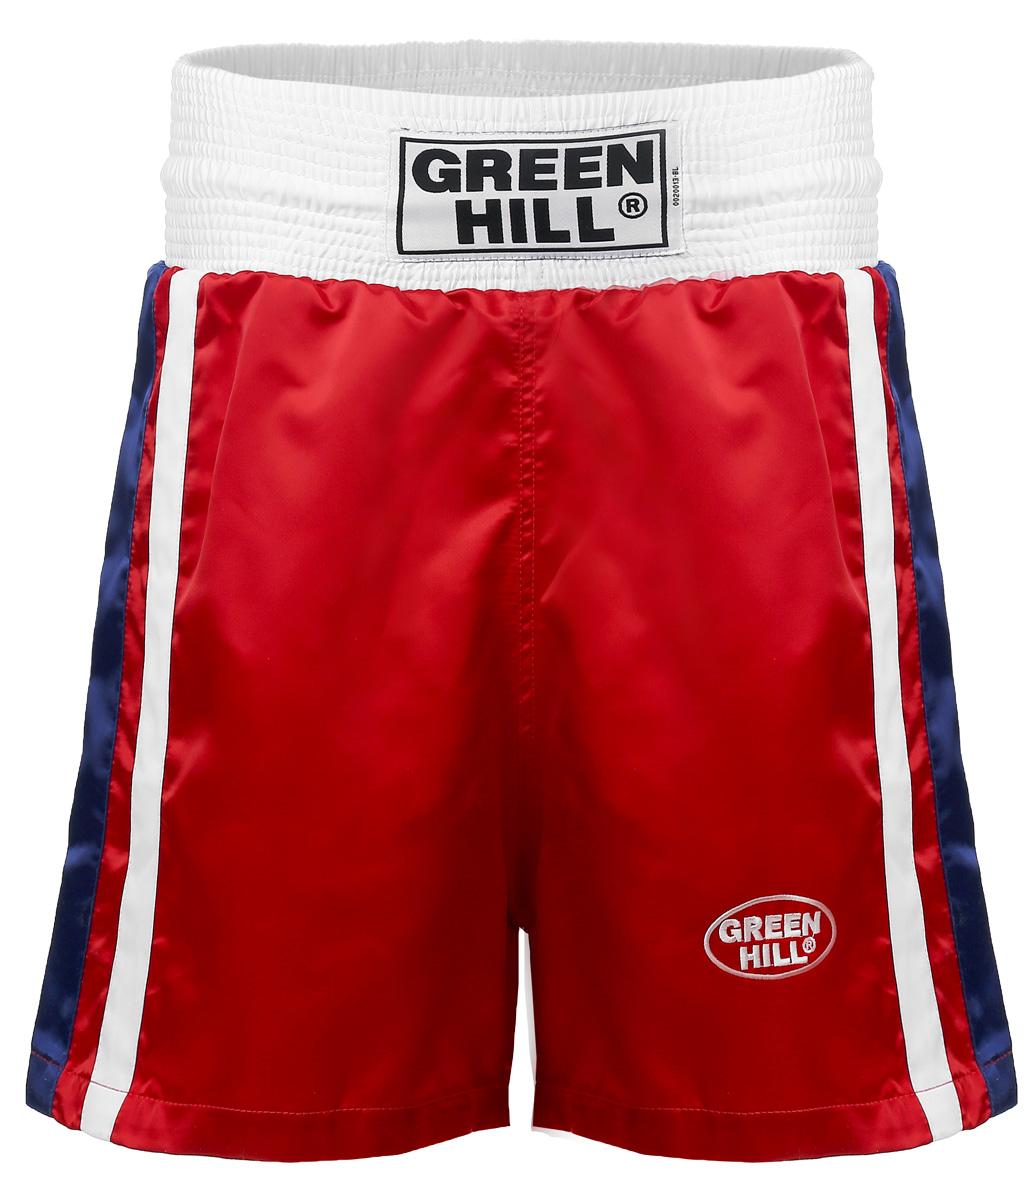 Трусы боксерские GREEN HILL OLIMPIC, цвет: красный. BSO-6320. Размер XS (44) трусы dressed in green трусы